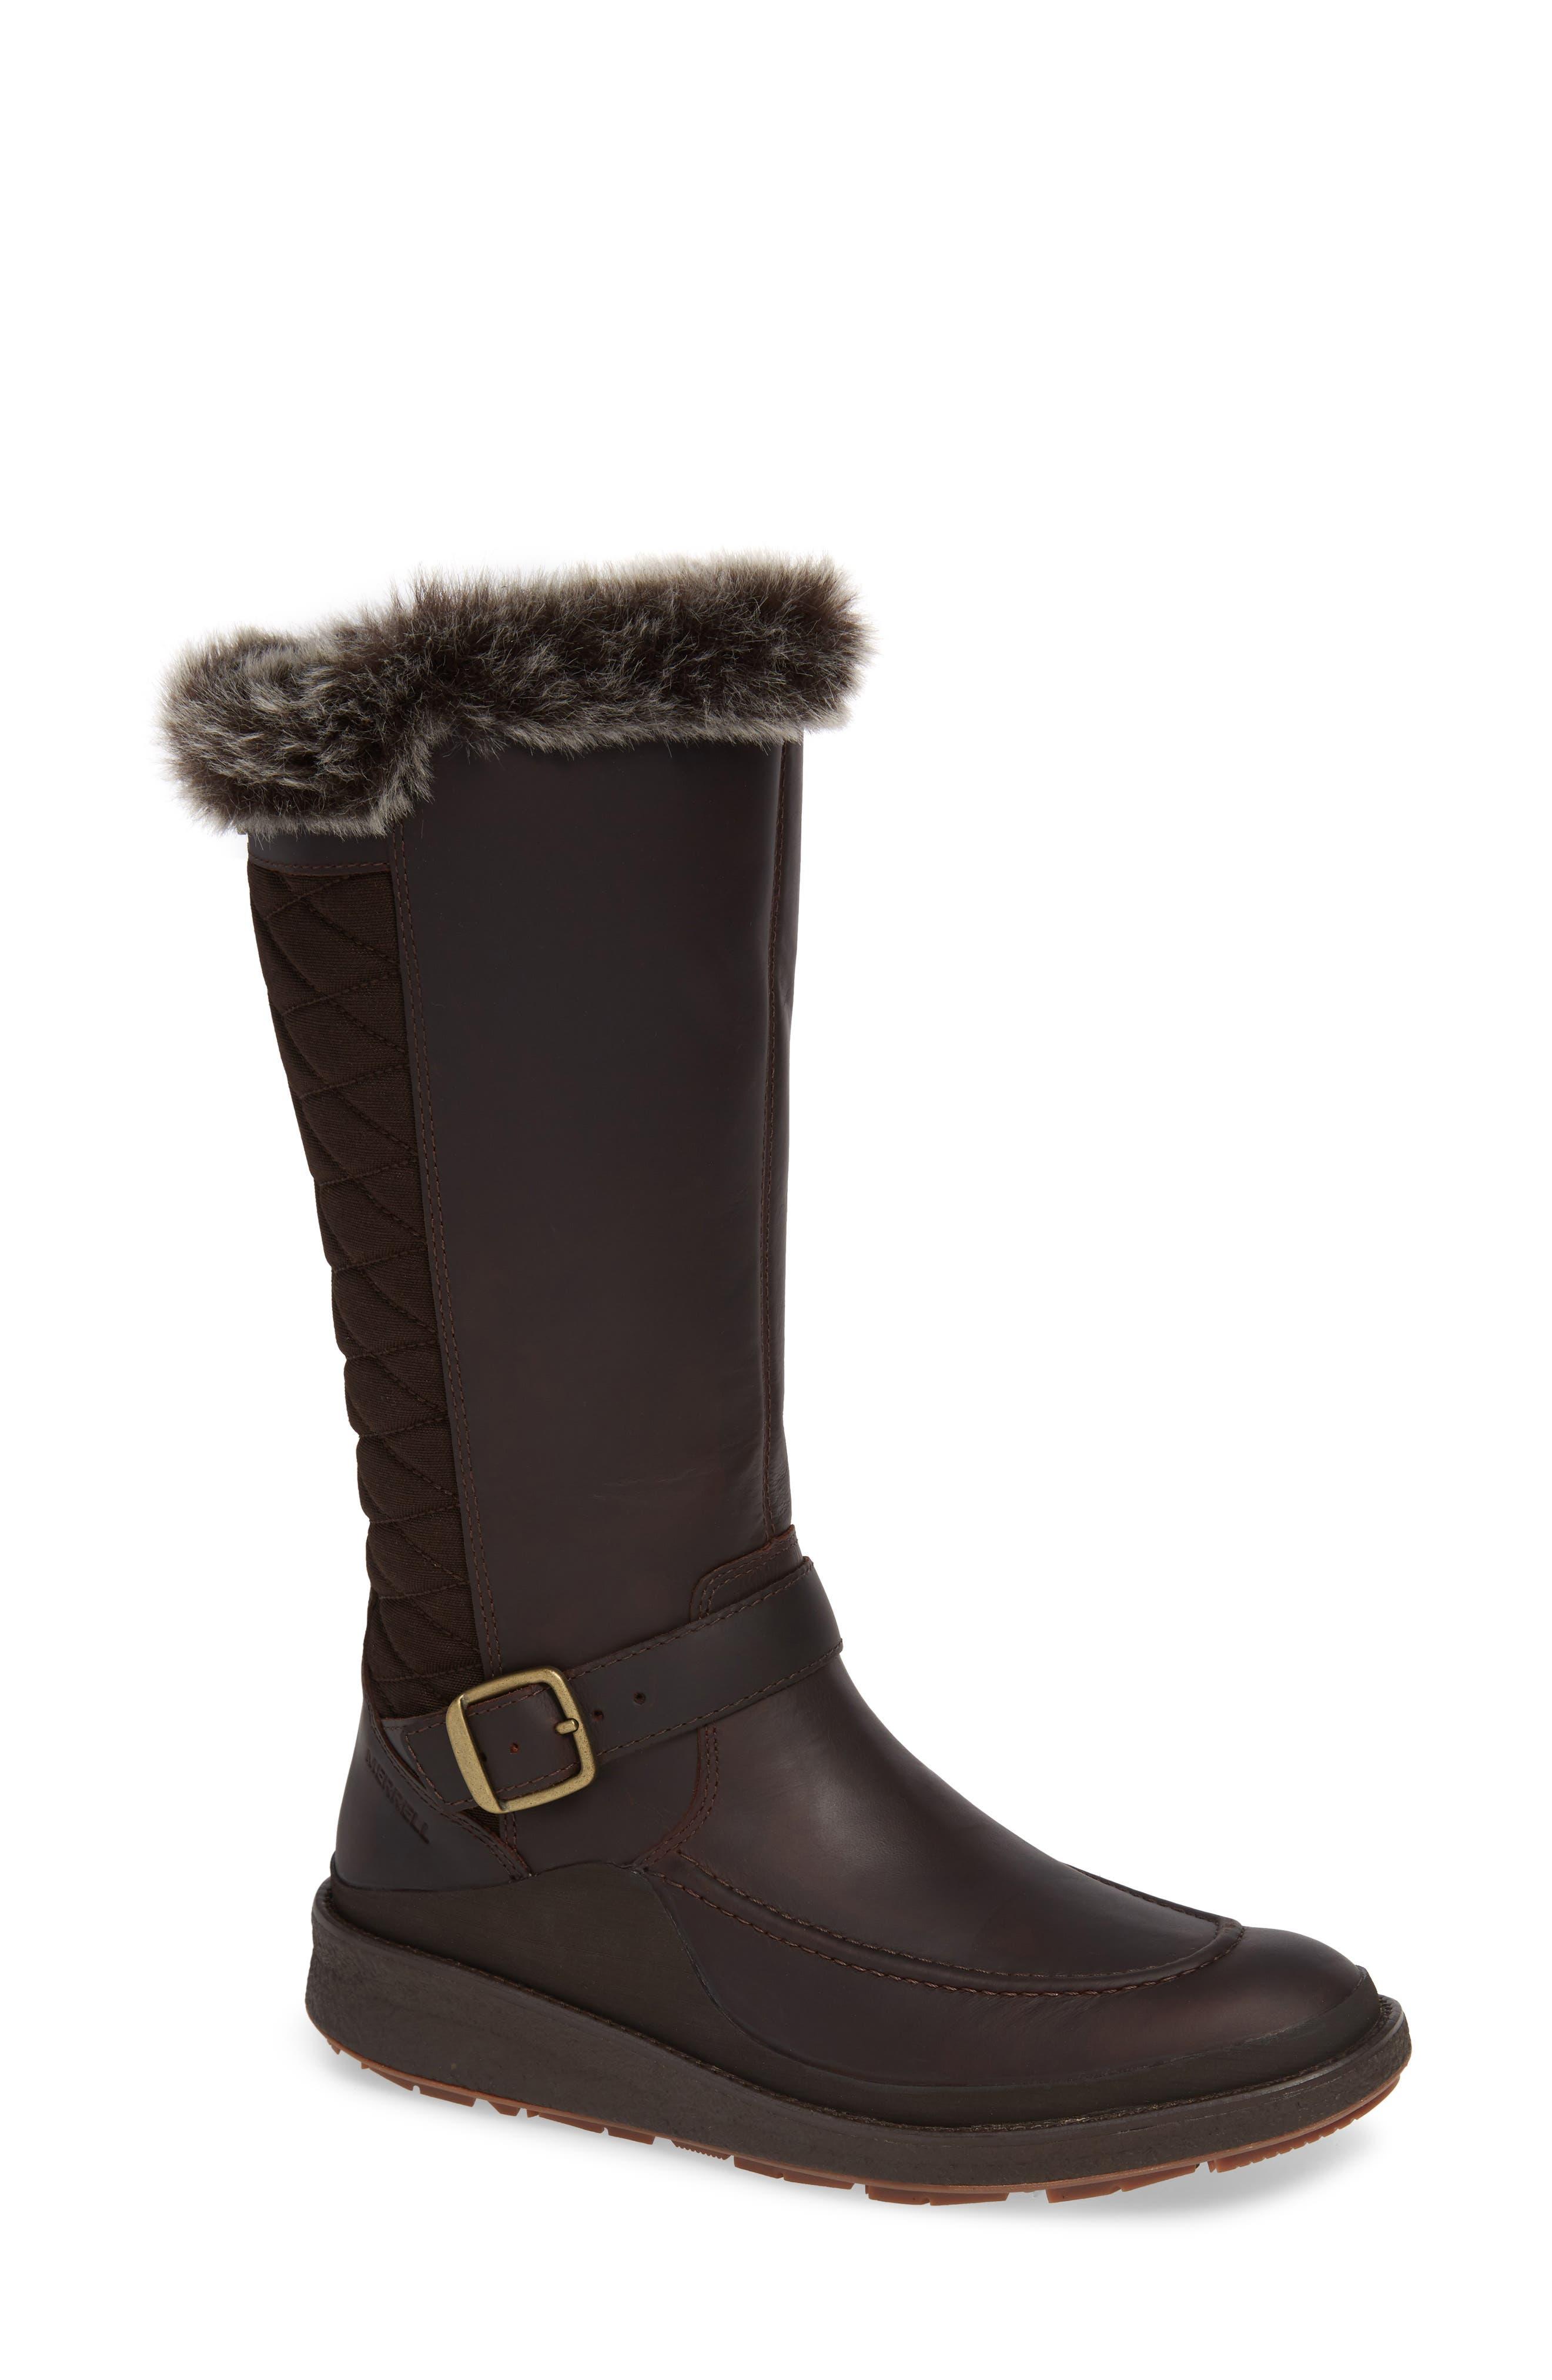 Merrell Tremblant Ezra Polar Waterproof Boot With Faux Fur Trim, Brown